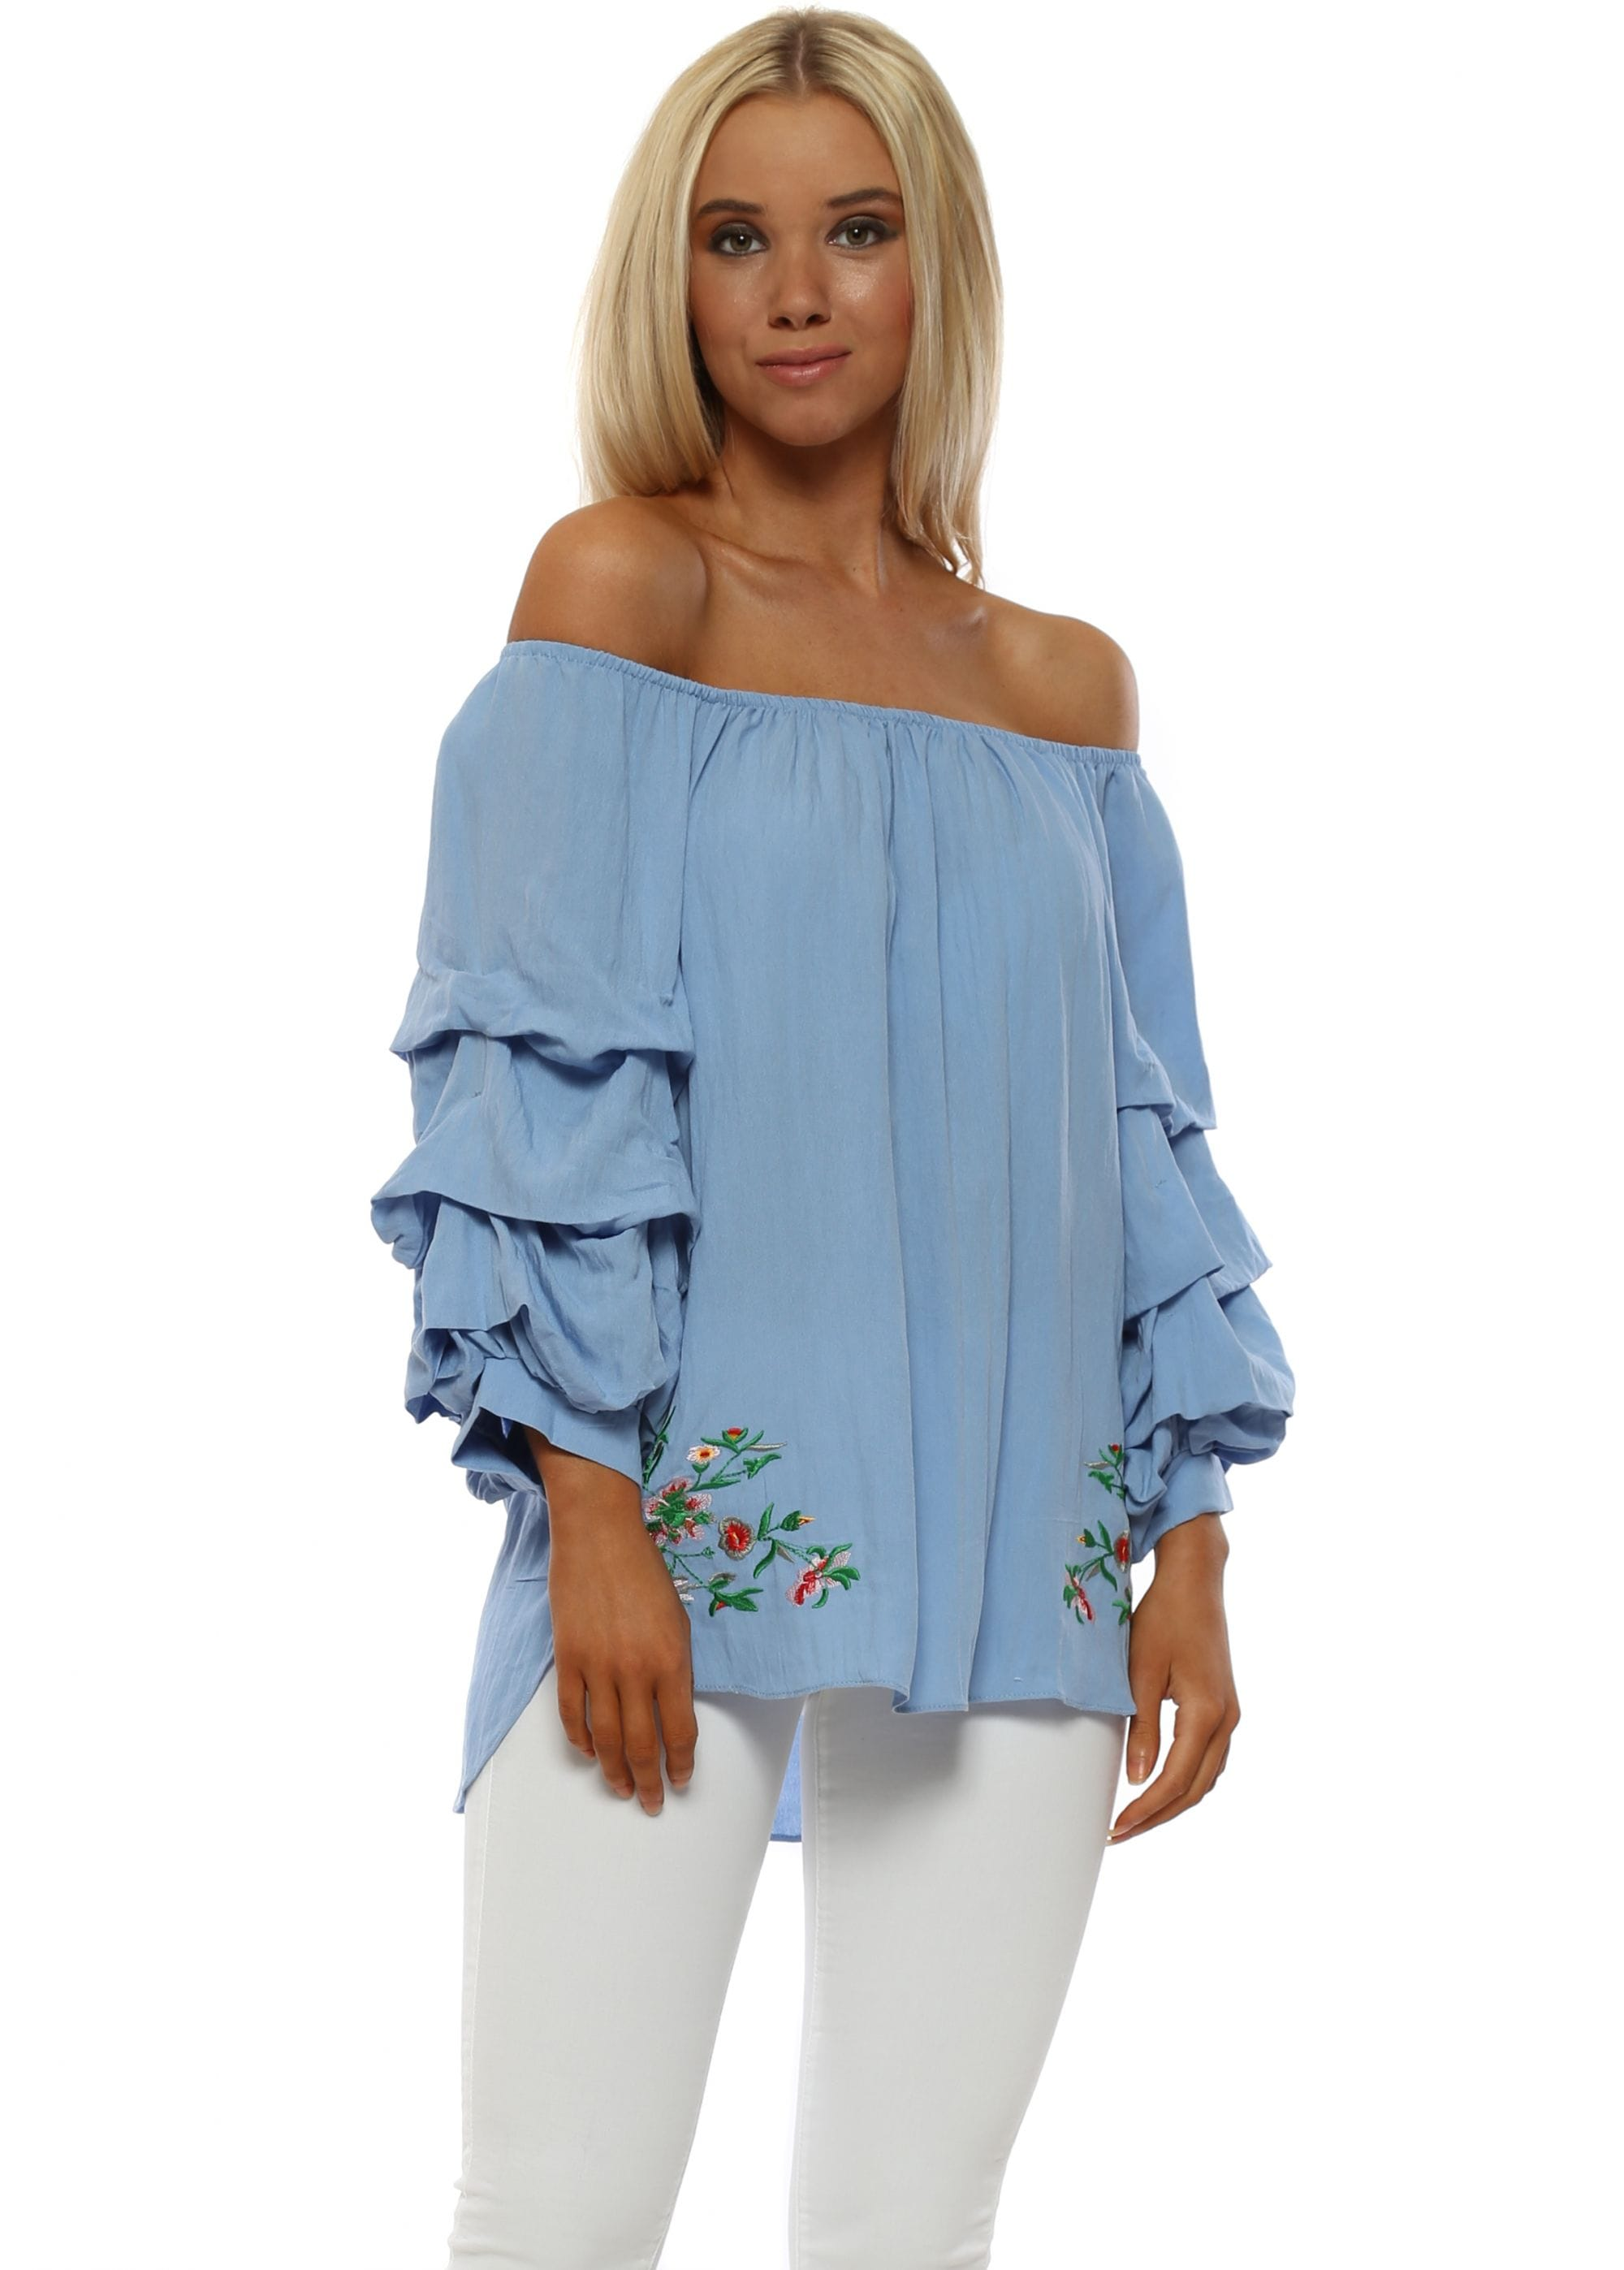 bfa0b7a3bba43 Denim Blue Ruched Sleeve Bardot Top